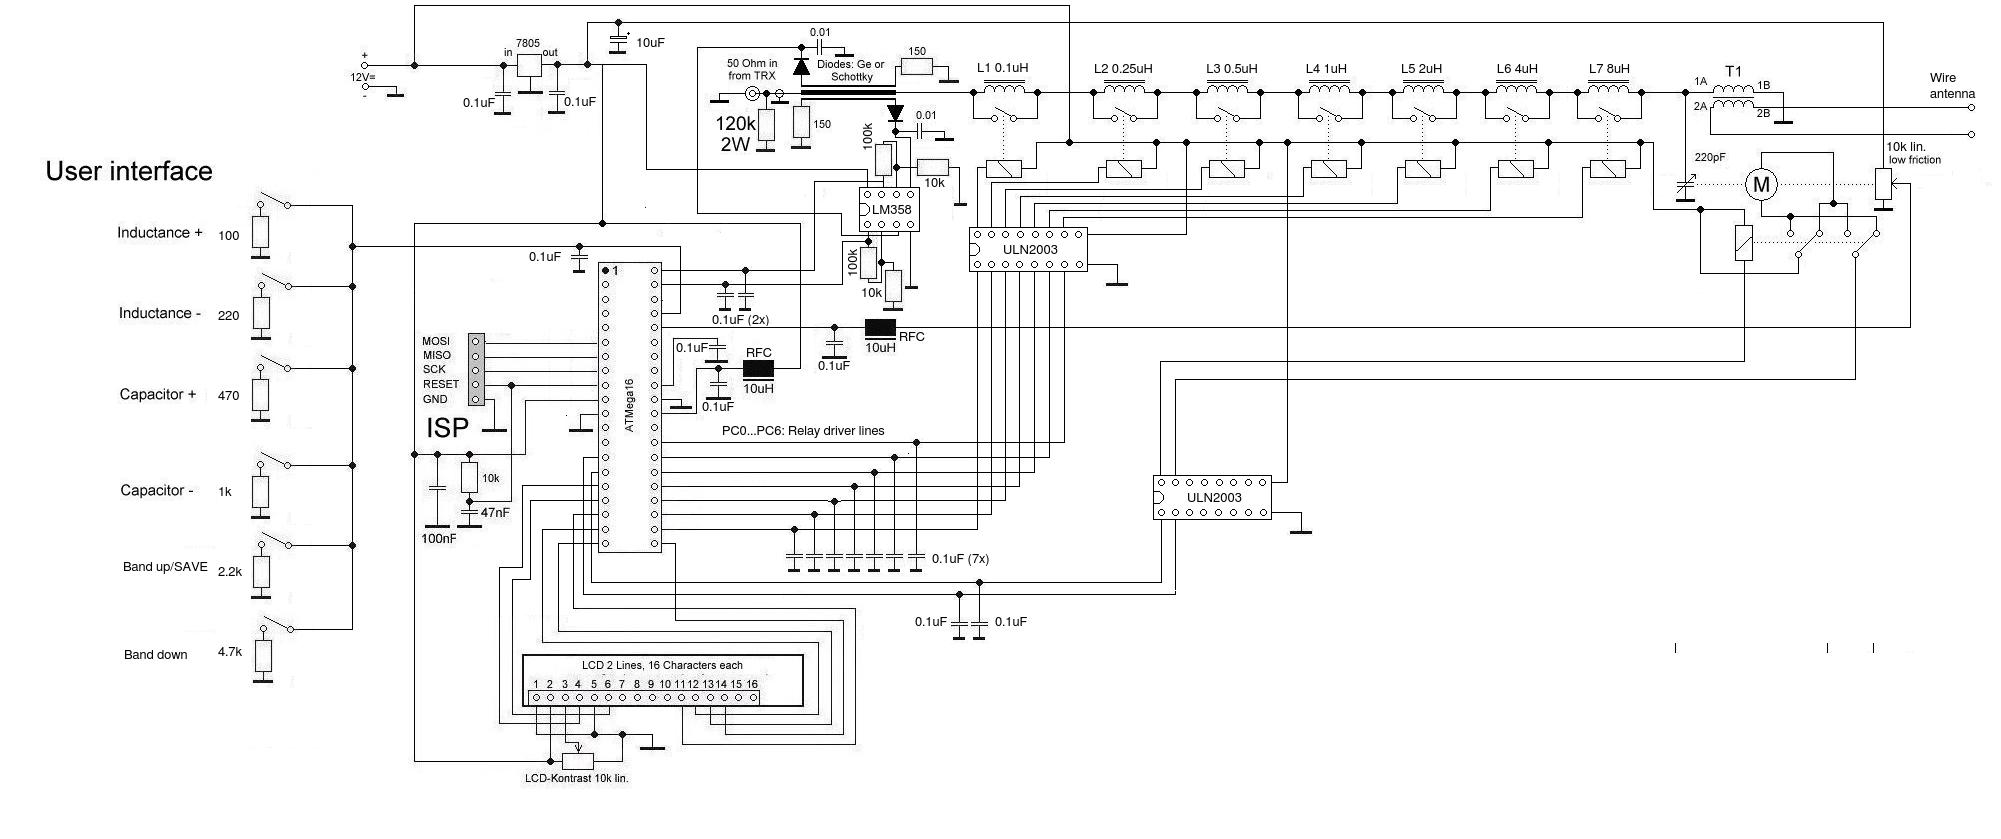 DK7IH semi automatic antenna tuner V2 (schematic)